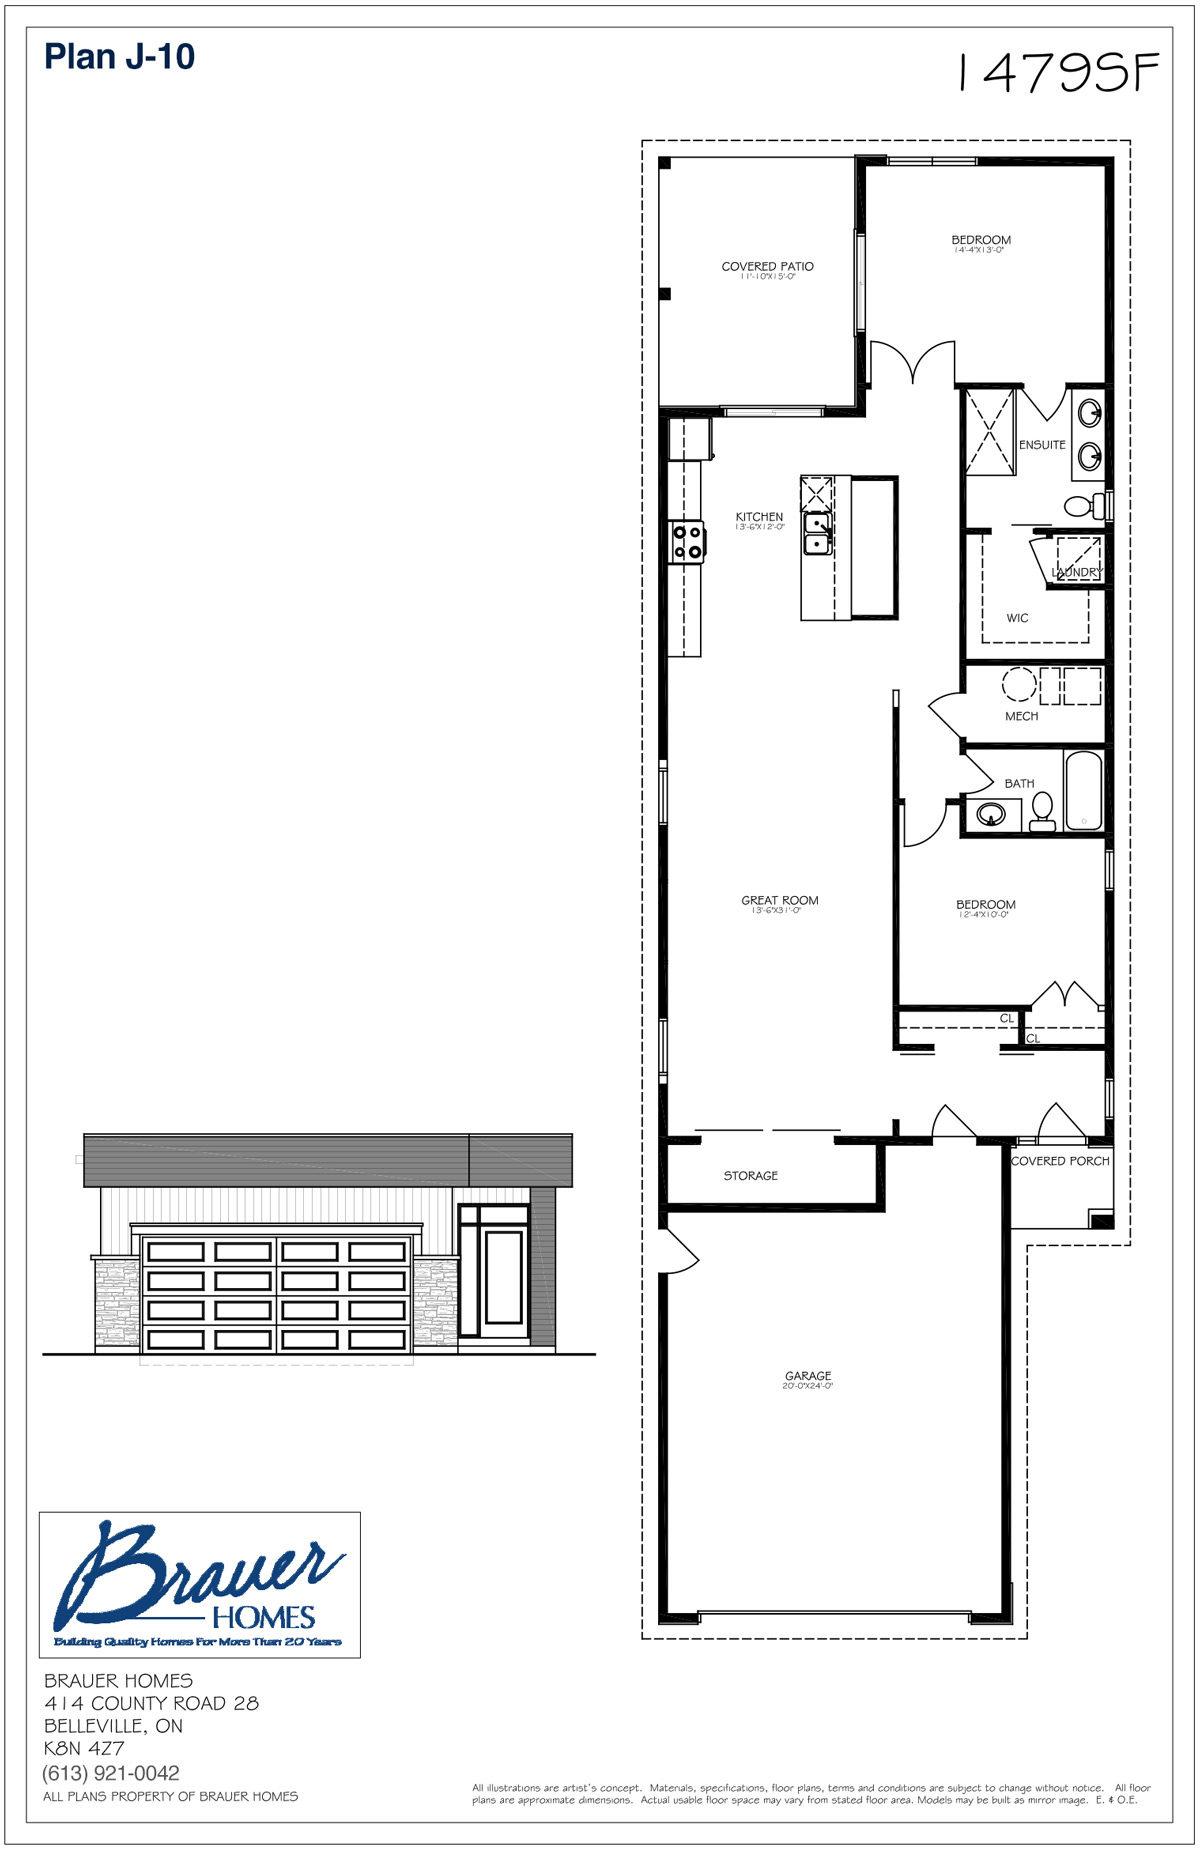 Brauer Build Plan J-10